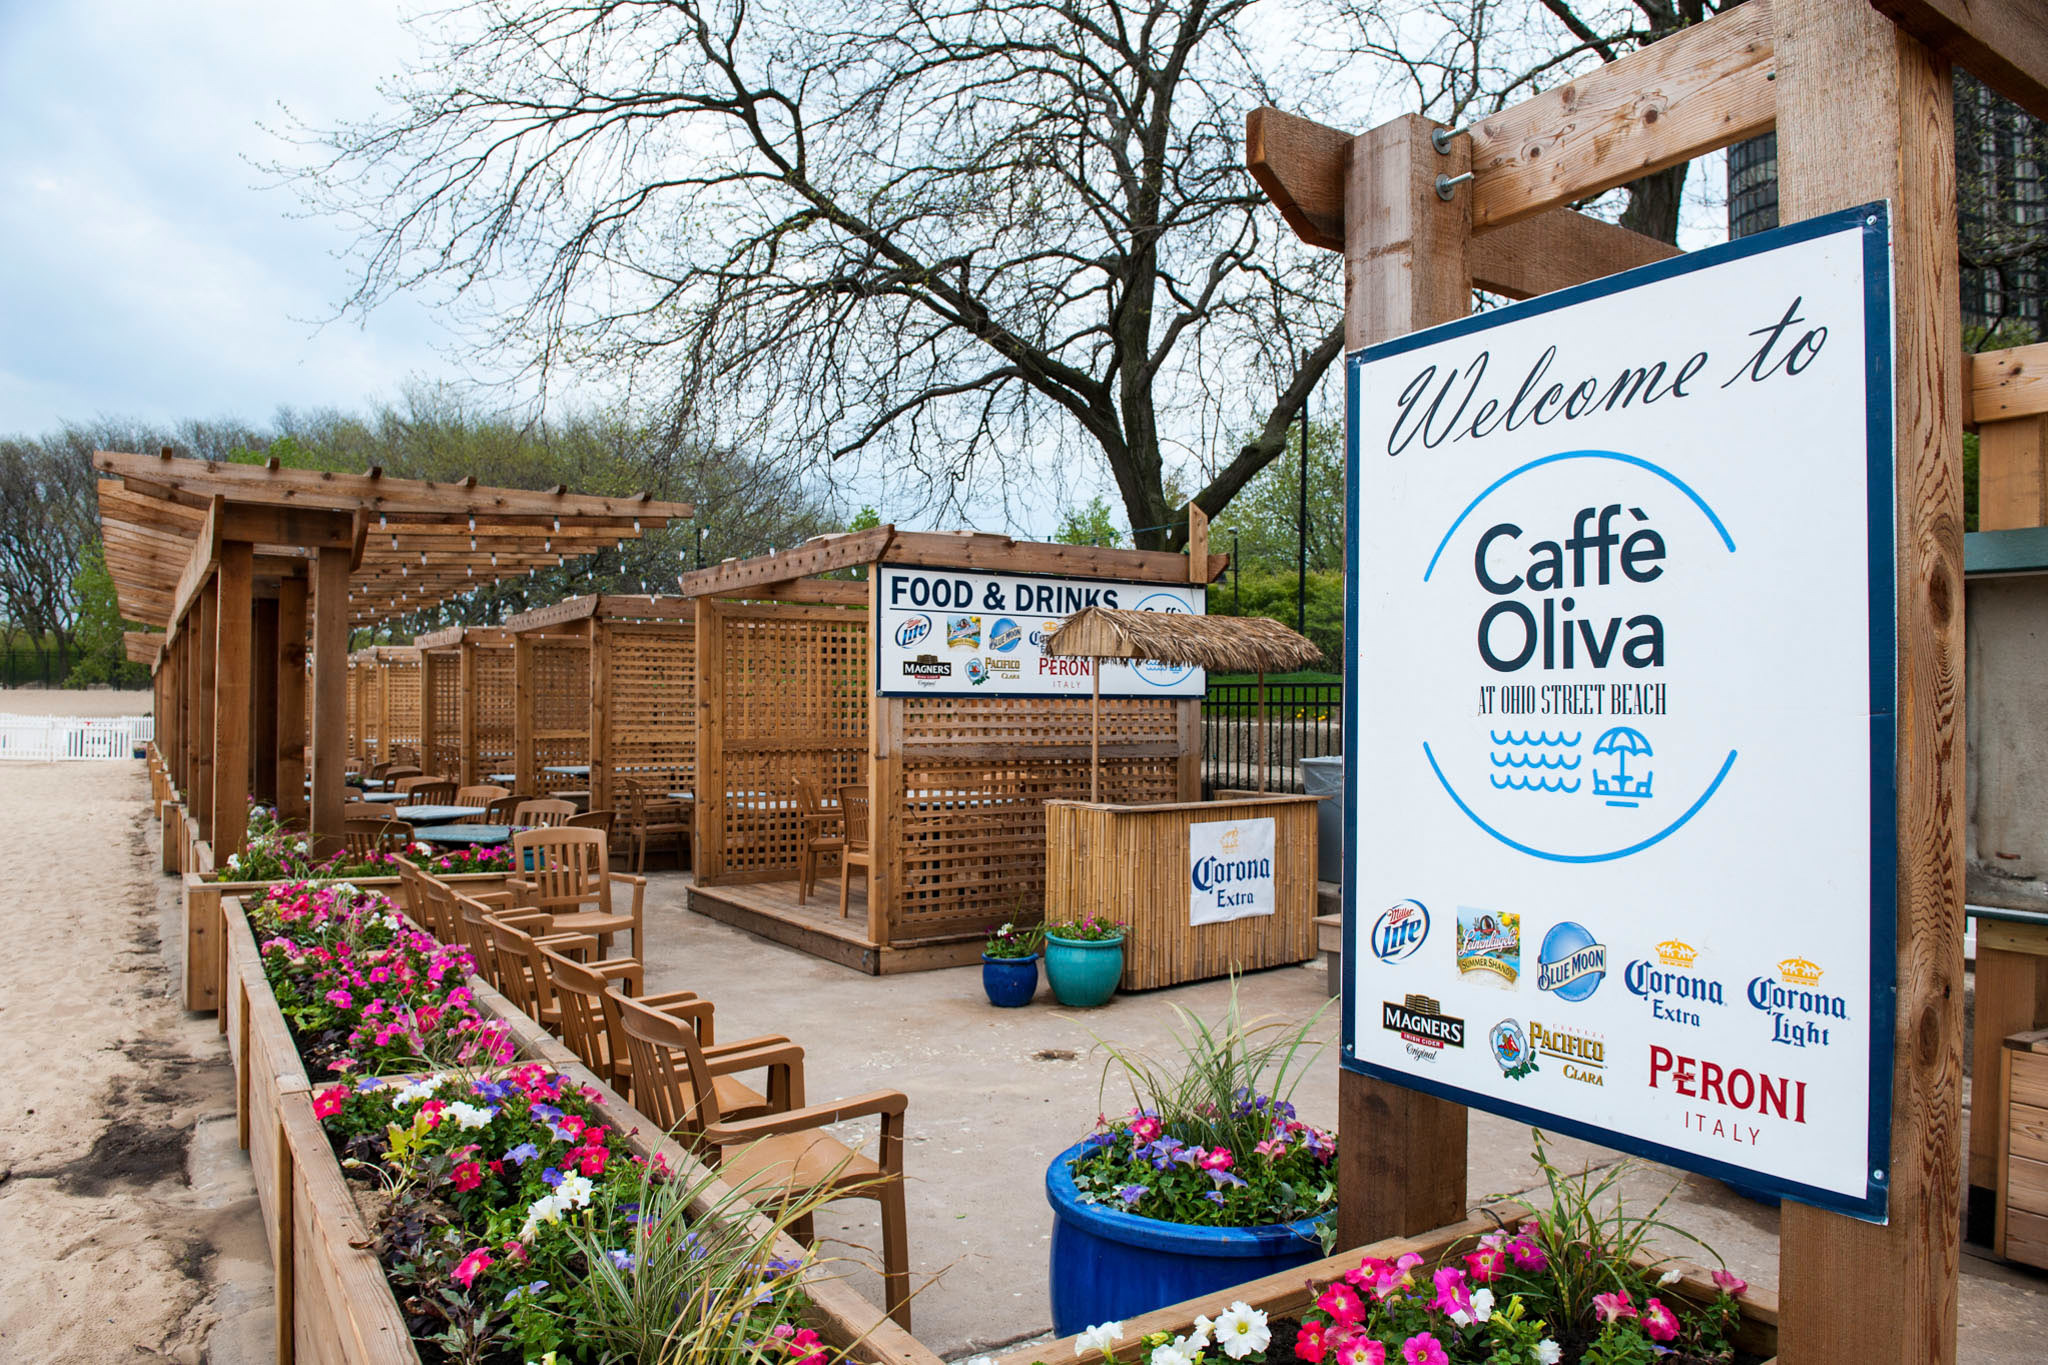 CaffeOliva.venue.jpg